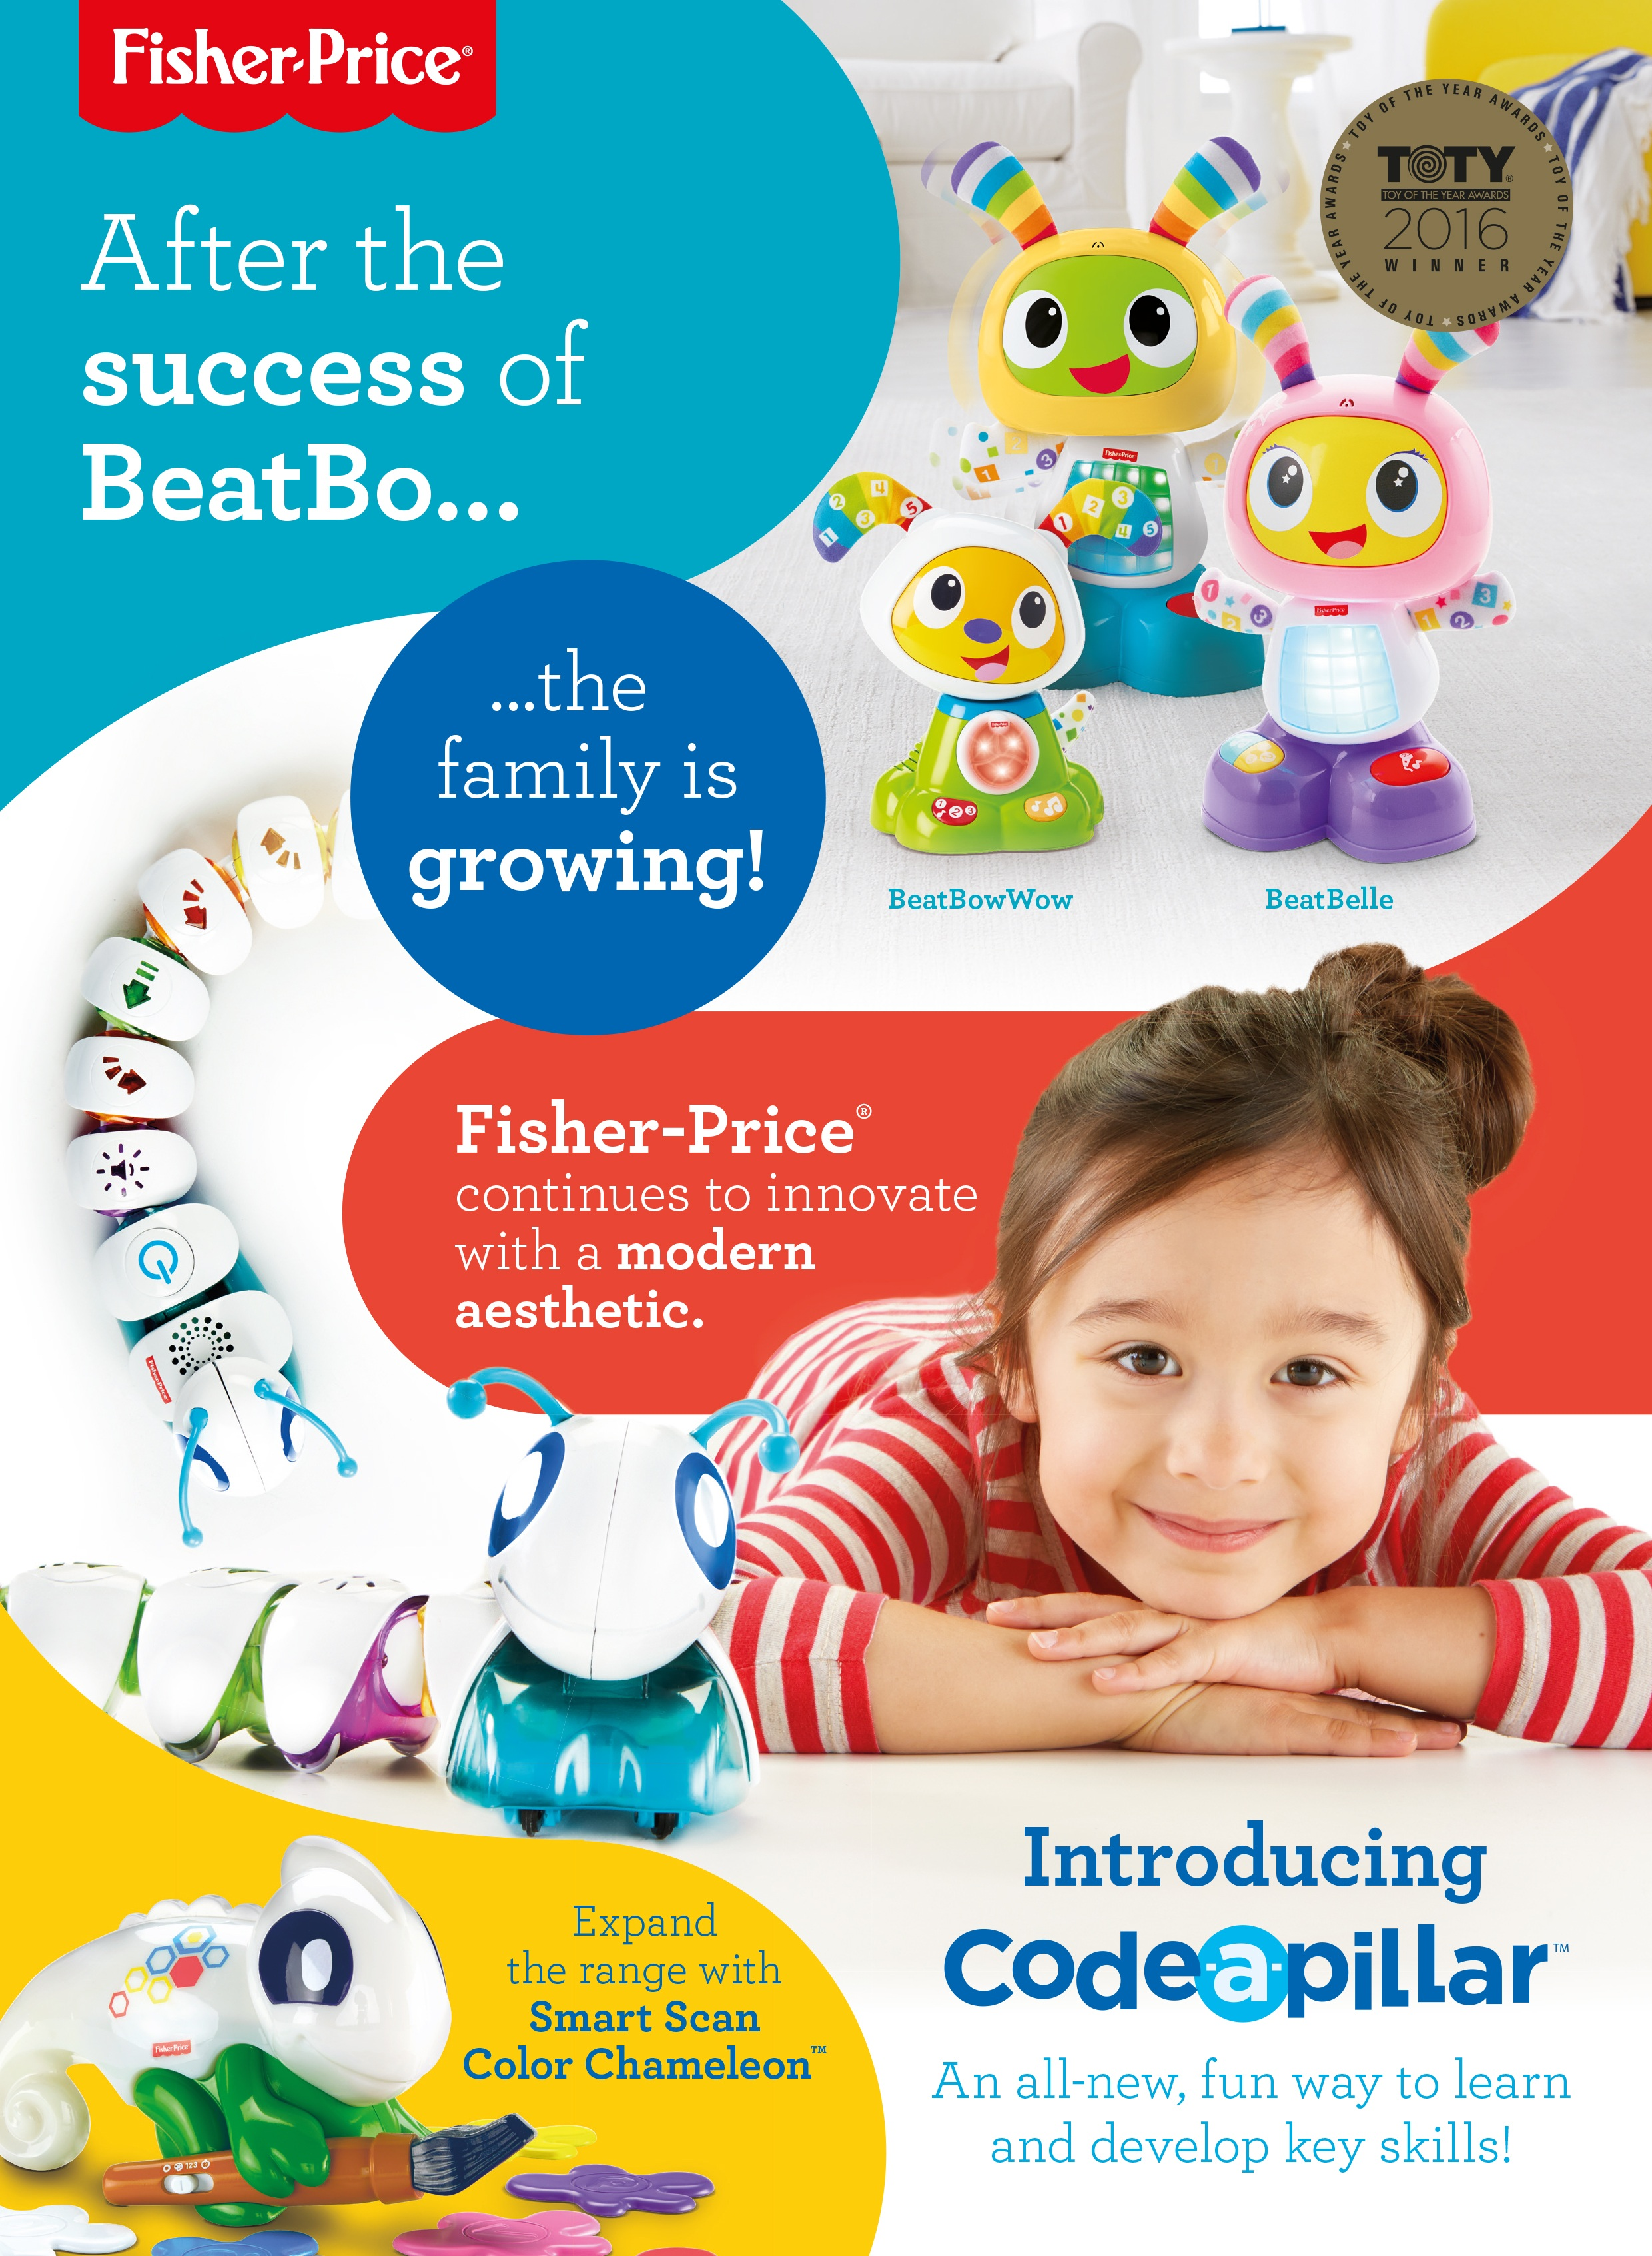 352919 Mattel 2016 FP Trade Press _ToysNPlaythings_Ad Page_AF.jpg